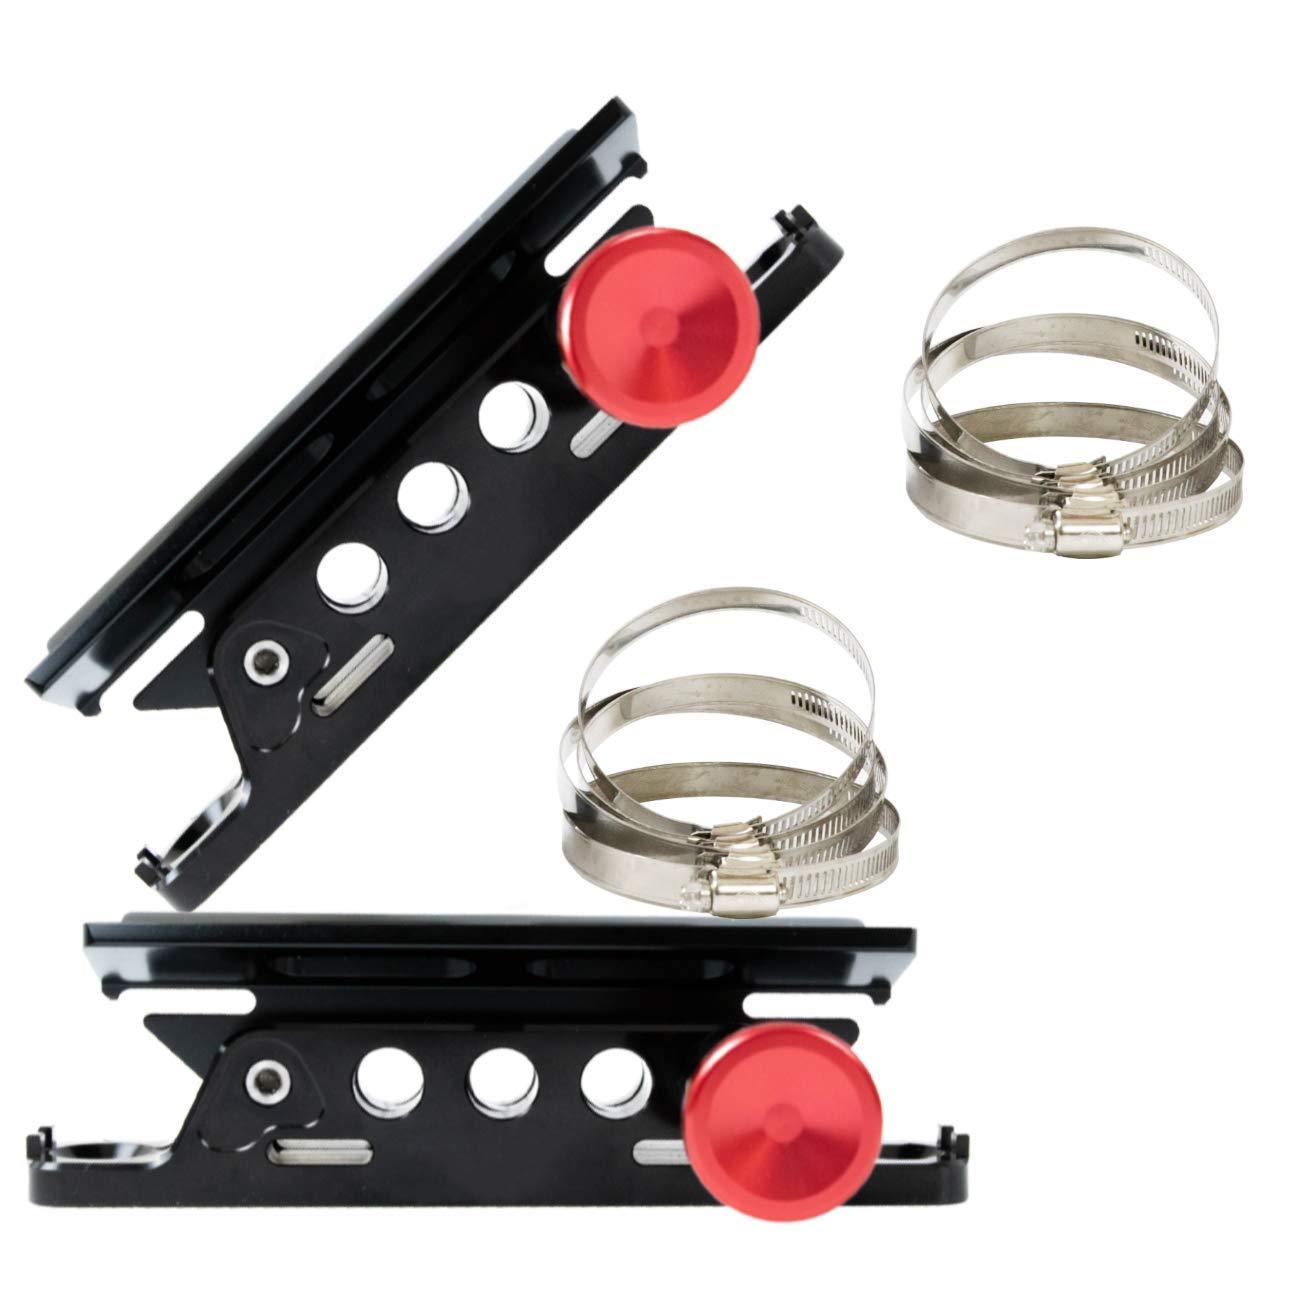 AUFER 2PCS Vehicle Universal Roll Bar Bottle/Fire Extinguisher Holder Mount,Adjustable, Aluminum by AUFER